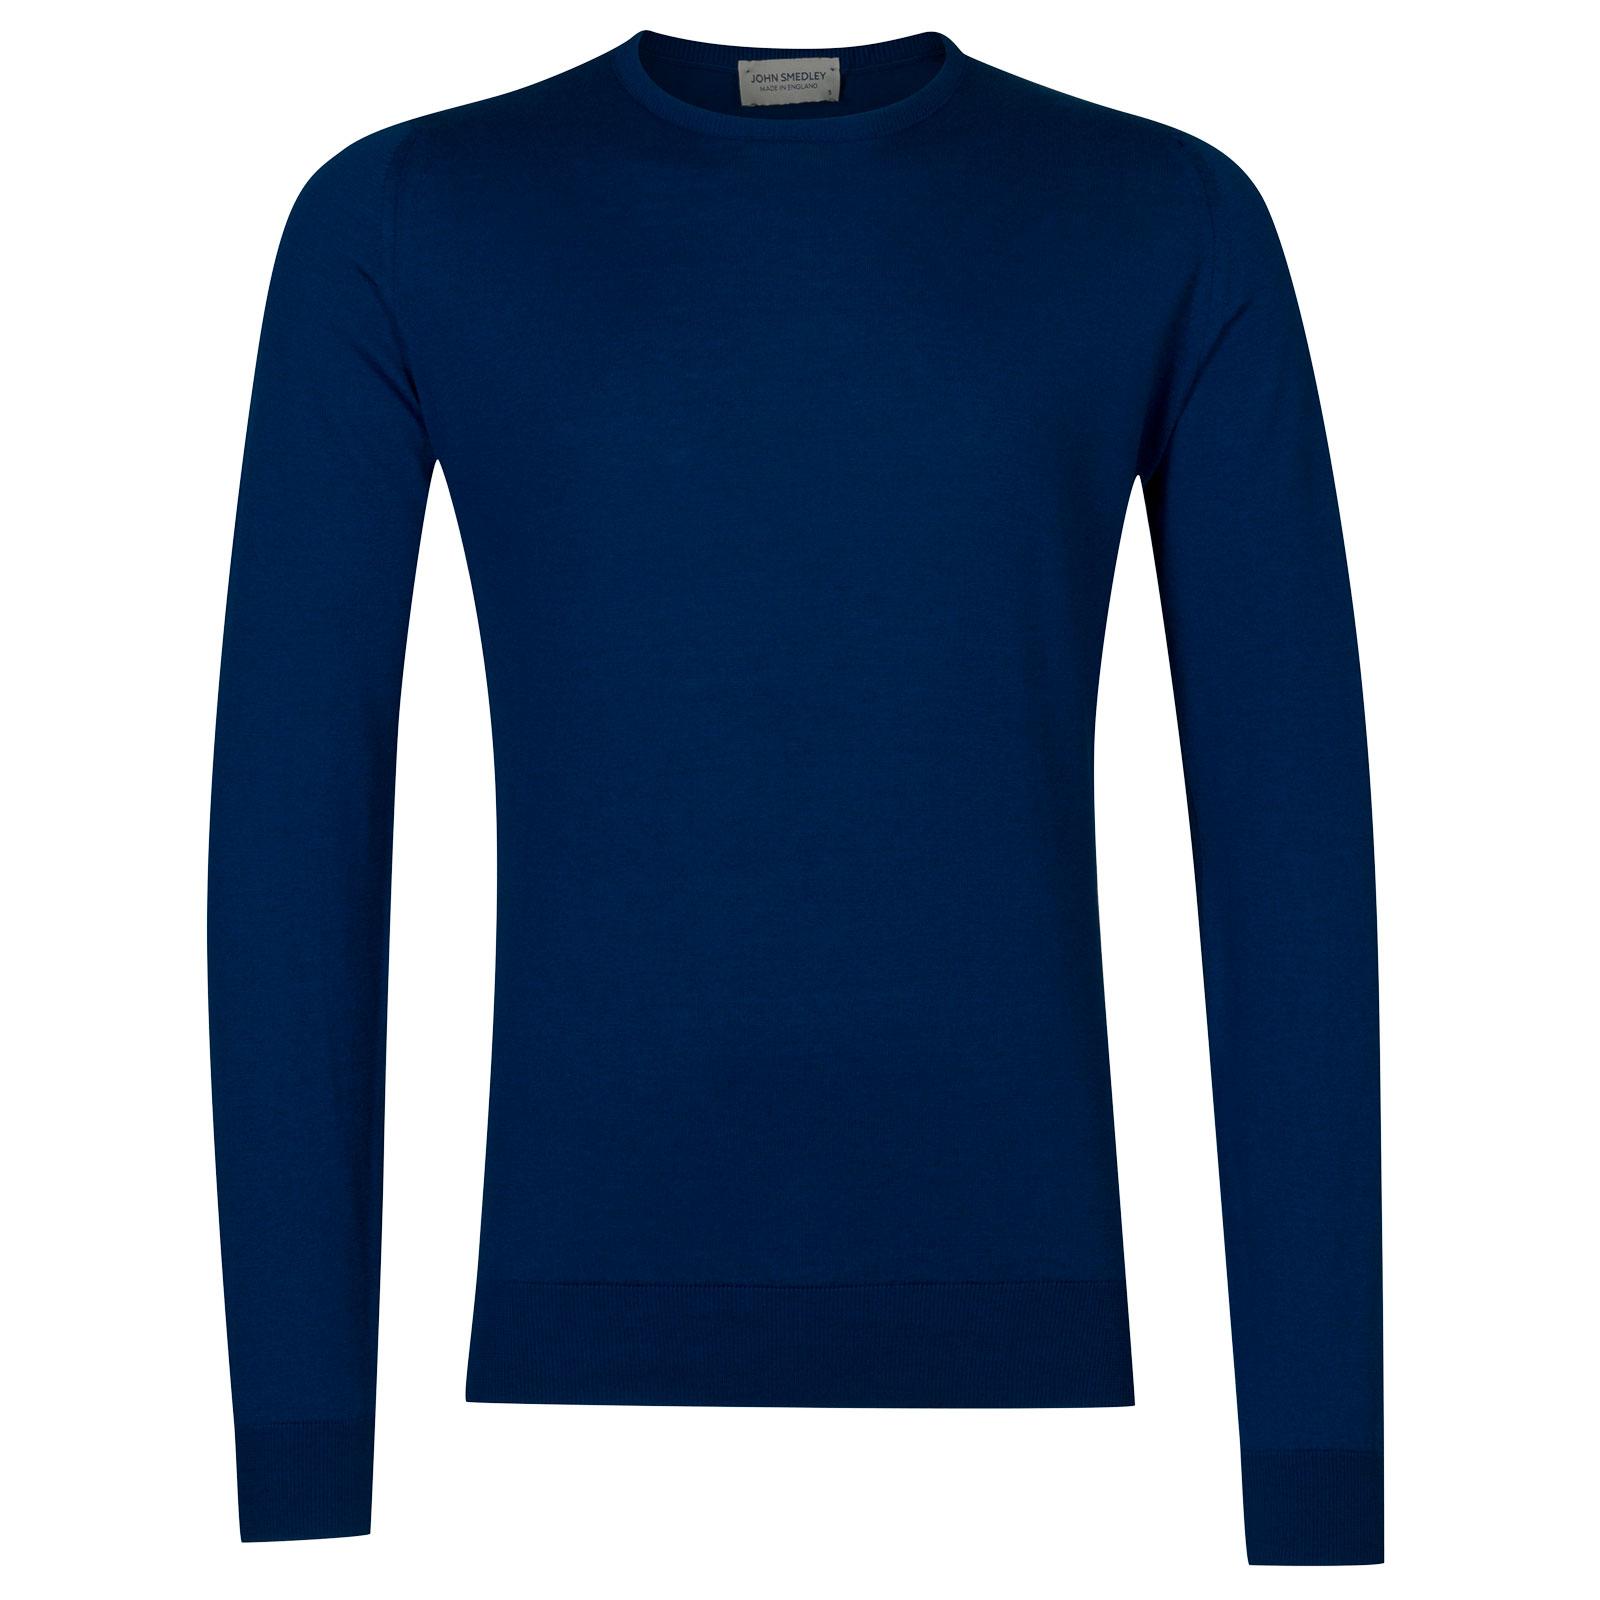 hatfield-stevens-blue-M